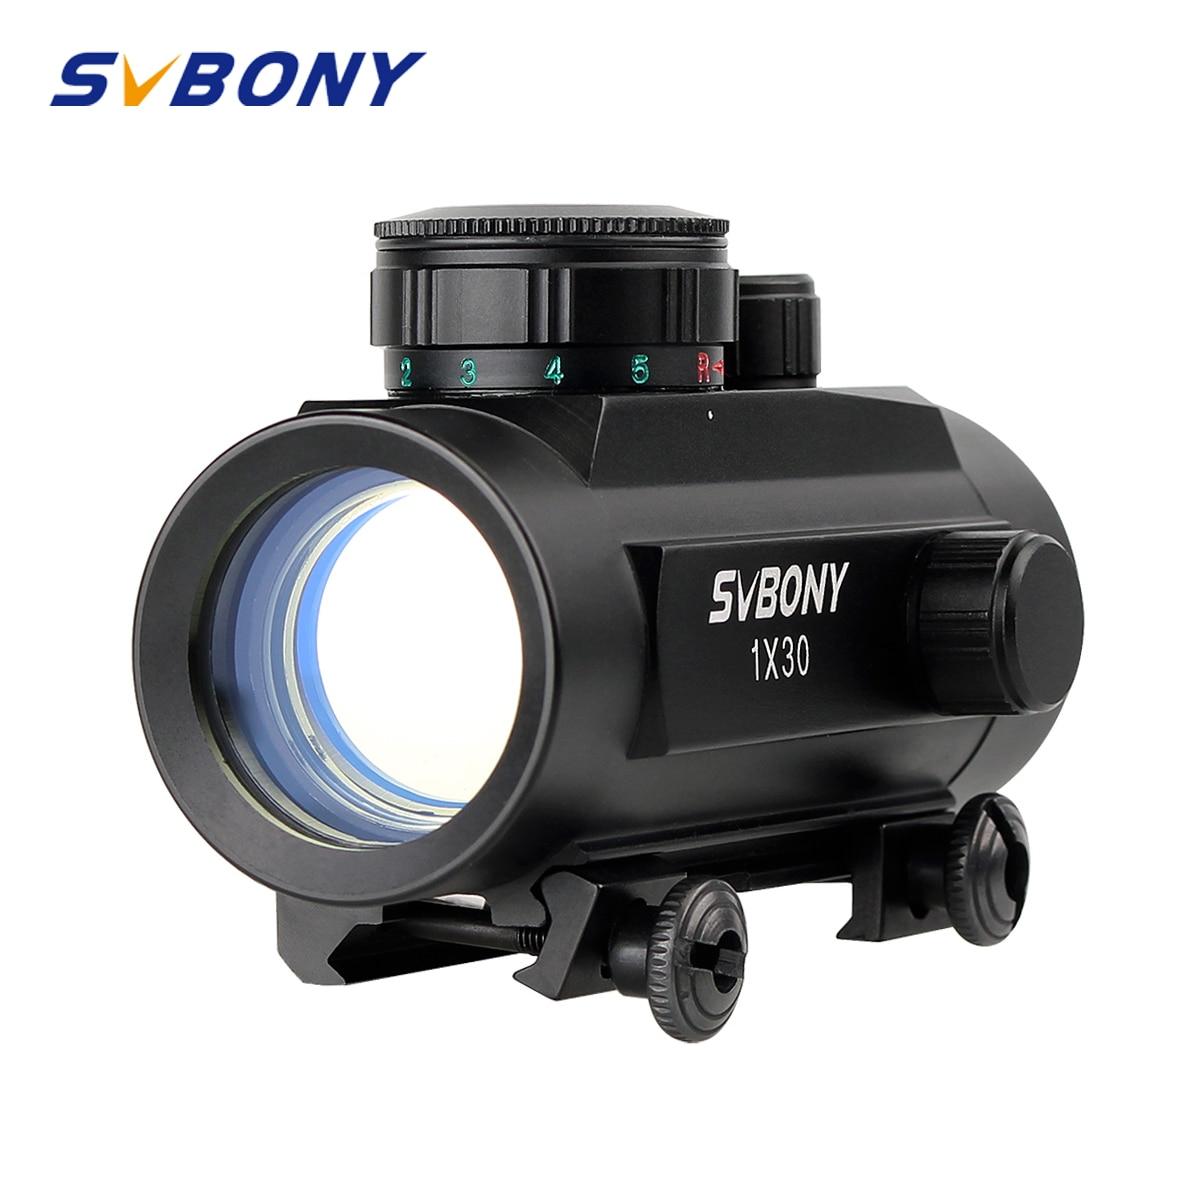 Svbony 1x30mm Sight Tactical Red Green Dot Riflescope Five Brightness Setting Reflex Sight Scope W/ 20mm Rail Mount F9148A